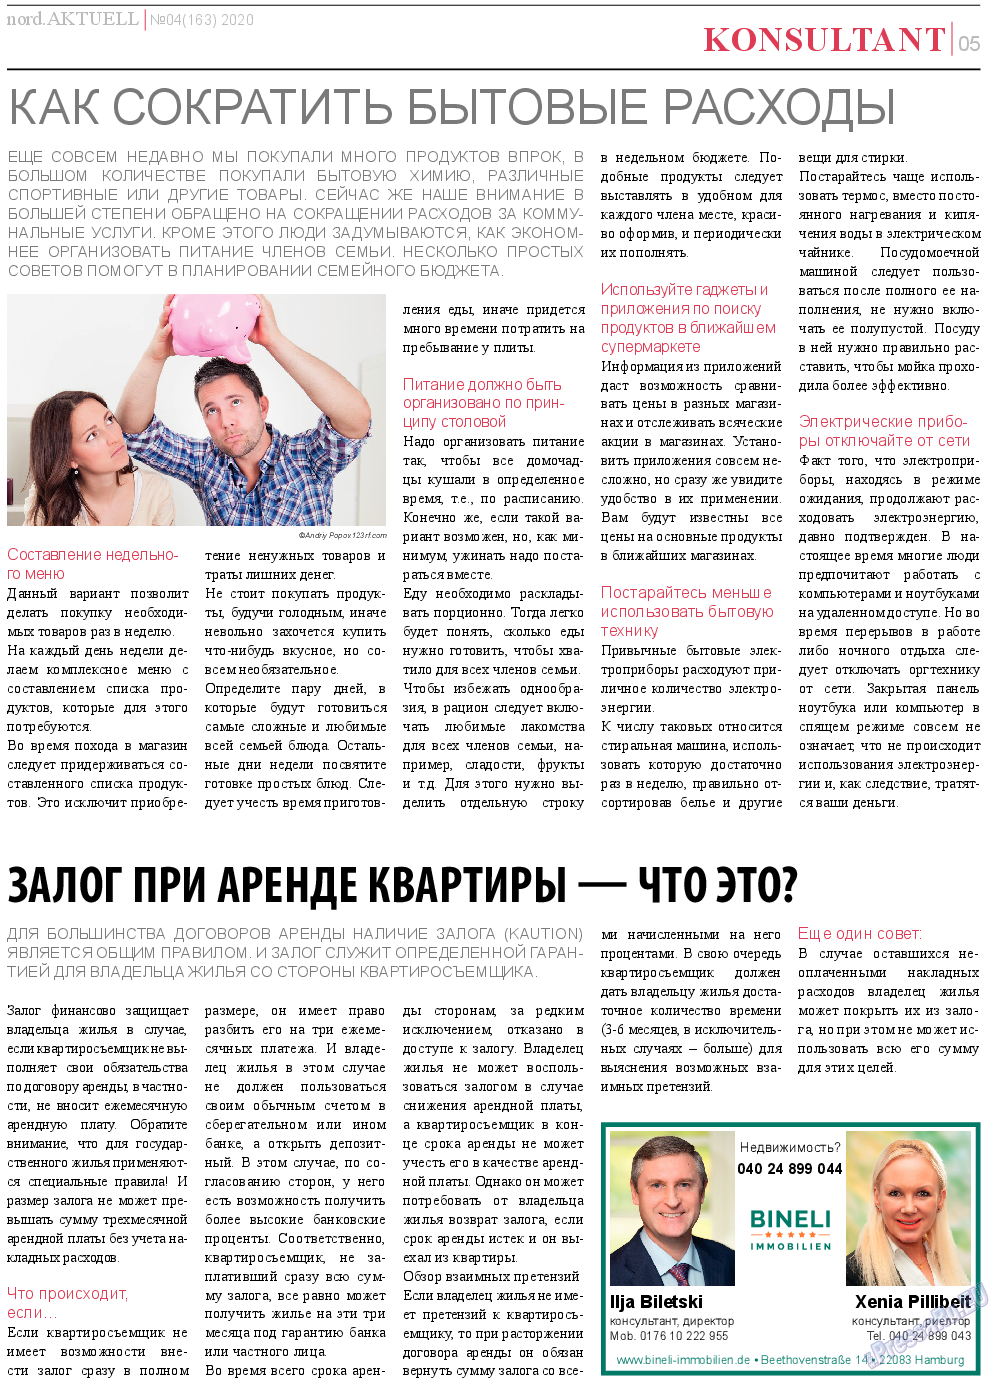 nord.Aktuell (газета). 2020 год, номер 4, стр. 5